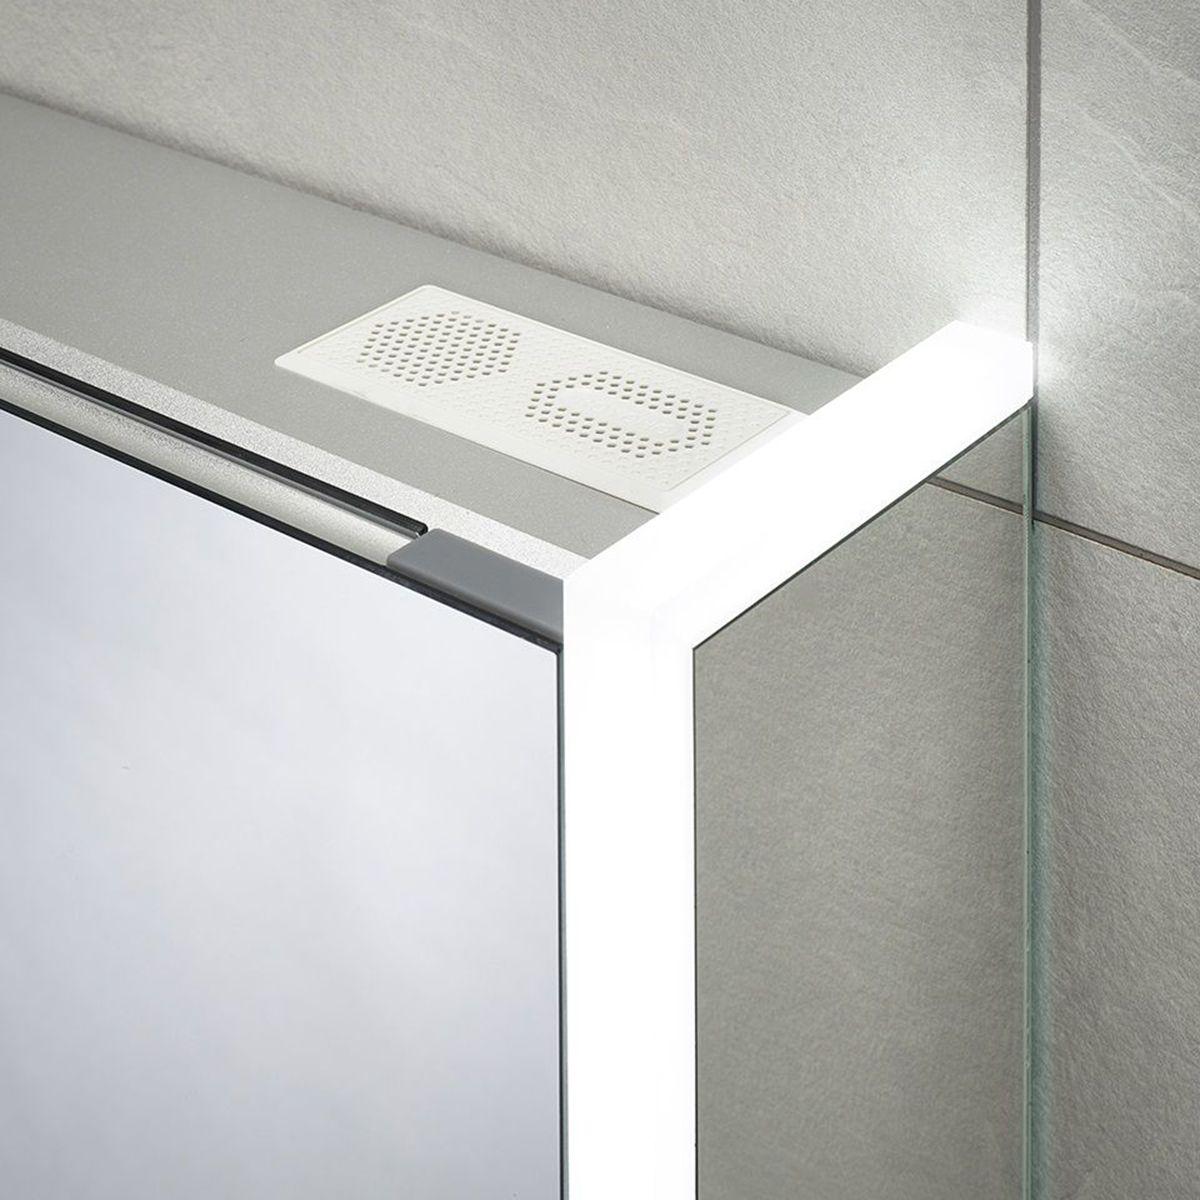 Sensio Ainsley Single Diffused LED Mirrored Cabinet Speaker